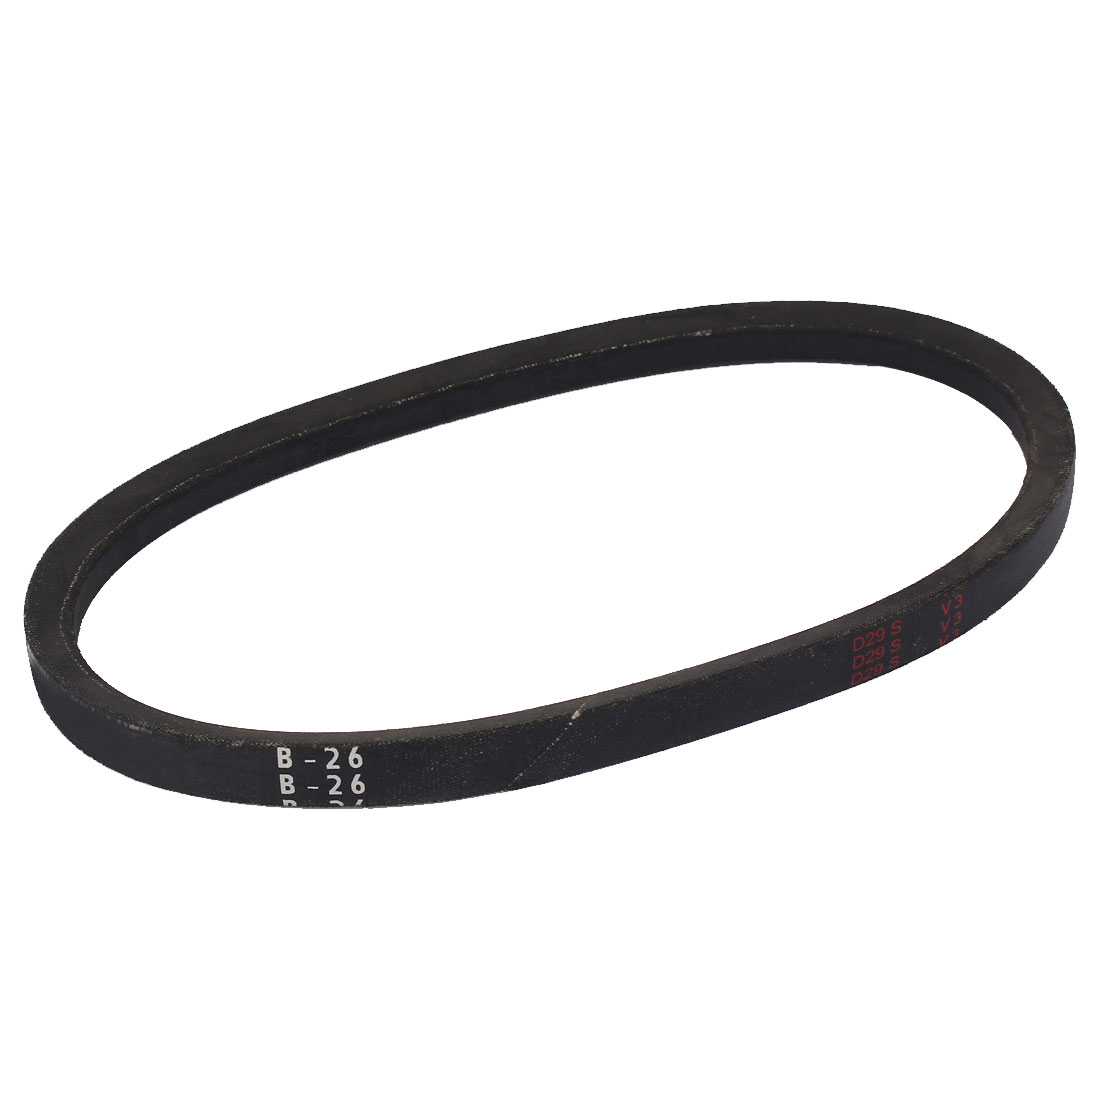 "B26 26"" x 0.67"" Industrial Machine Rubber Drive Belt V-Belt"